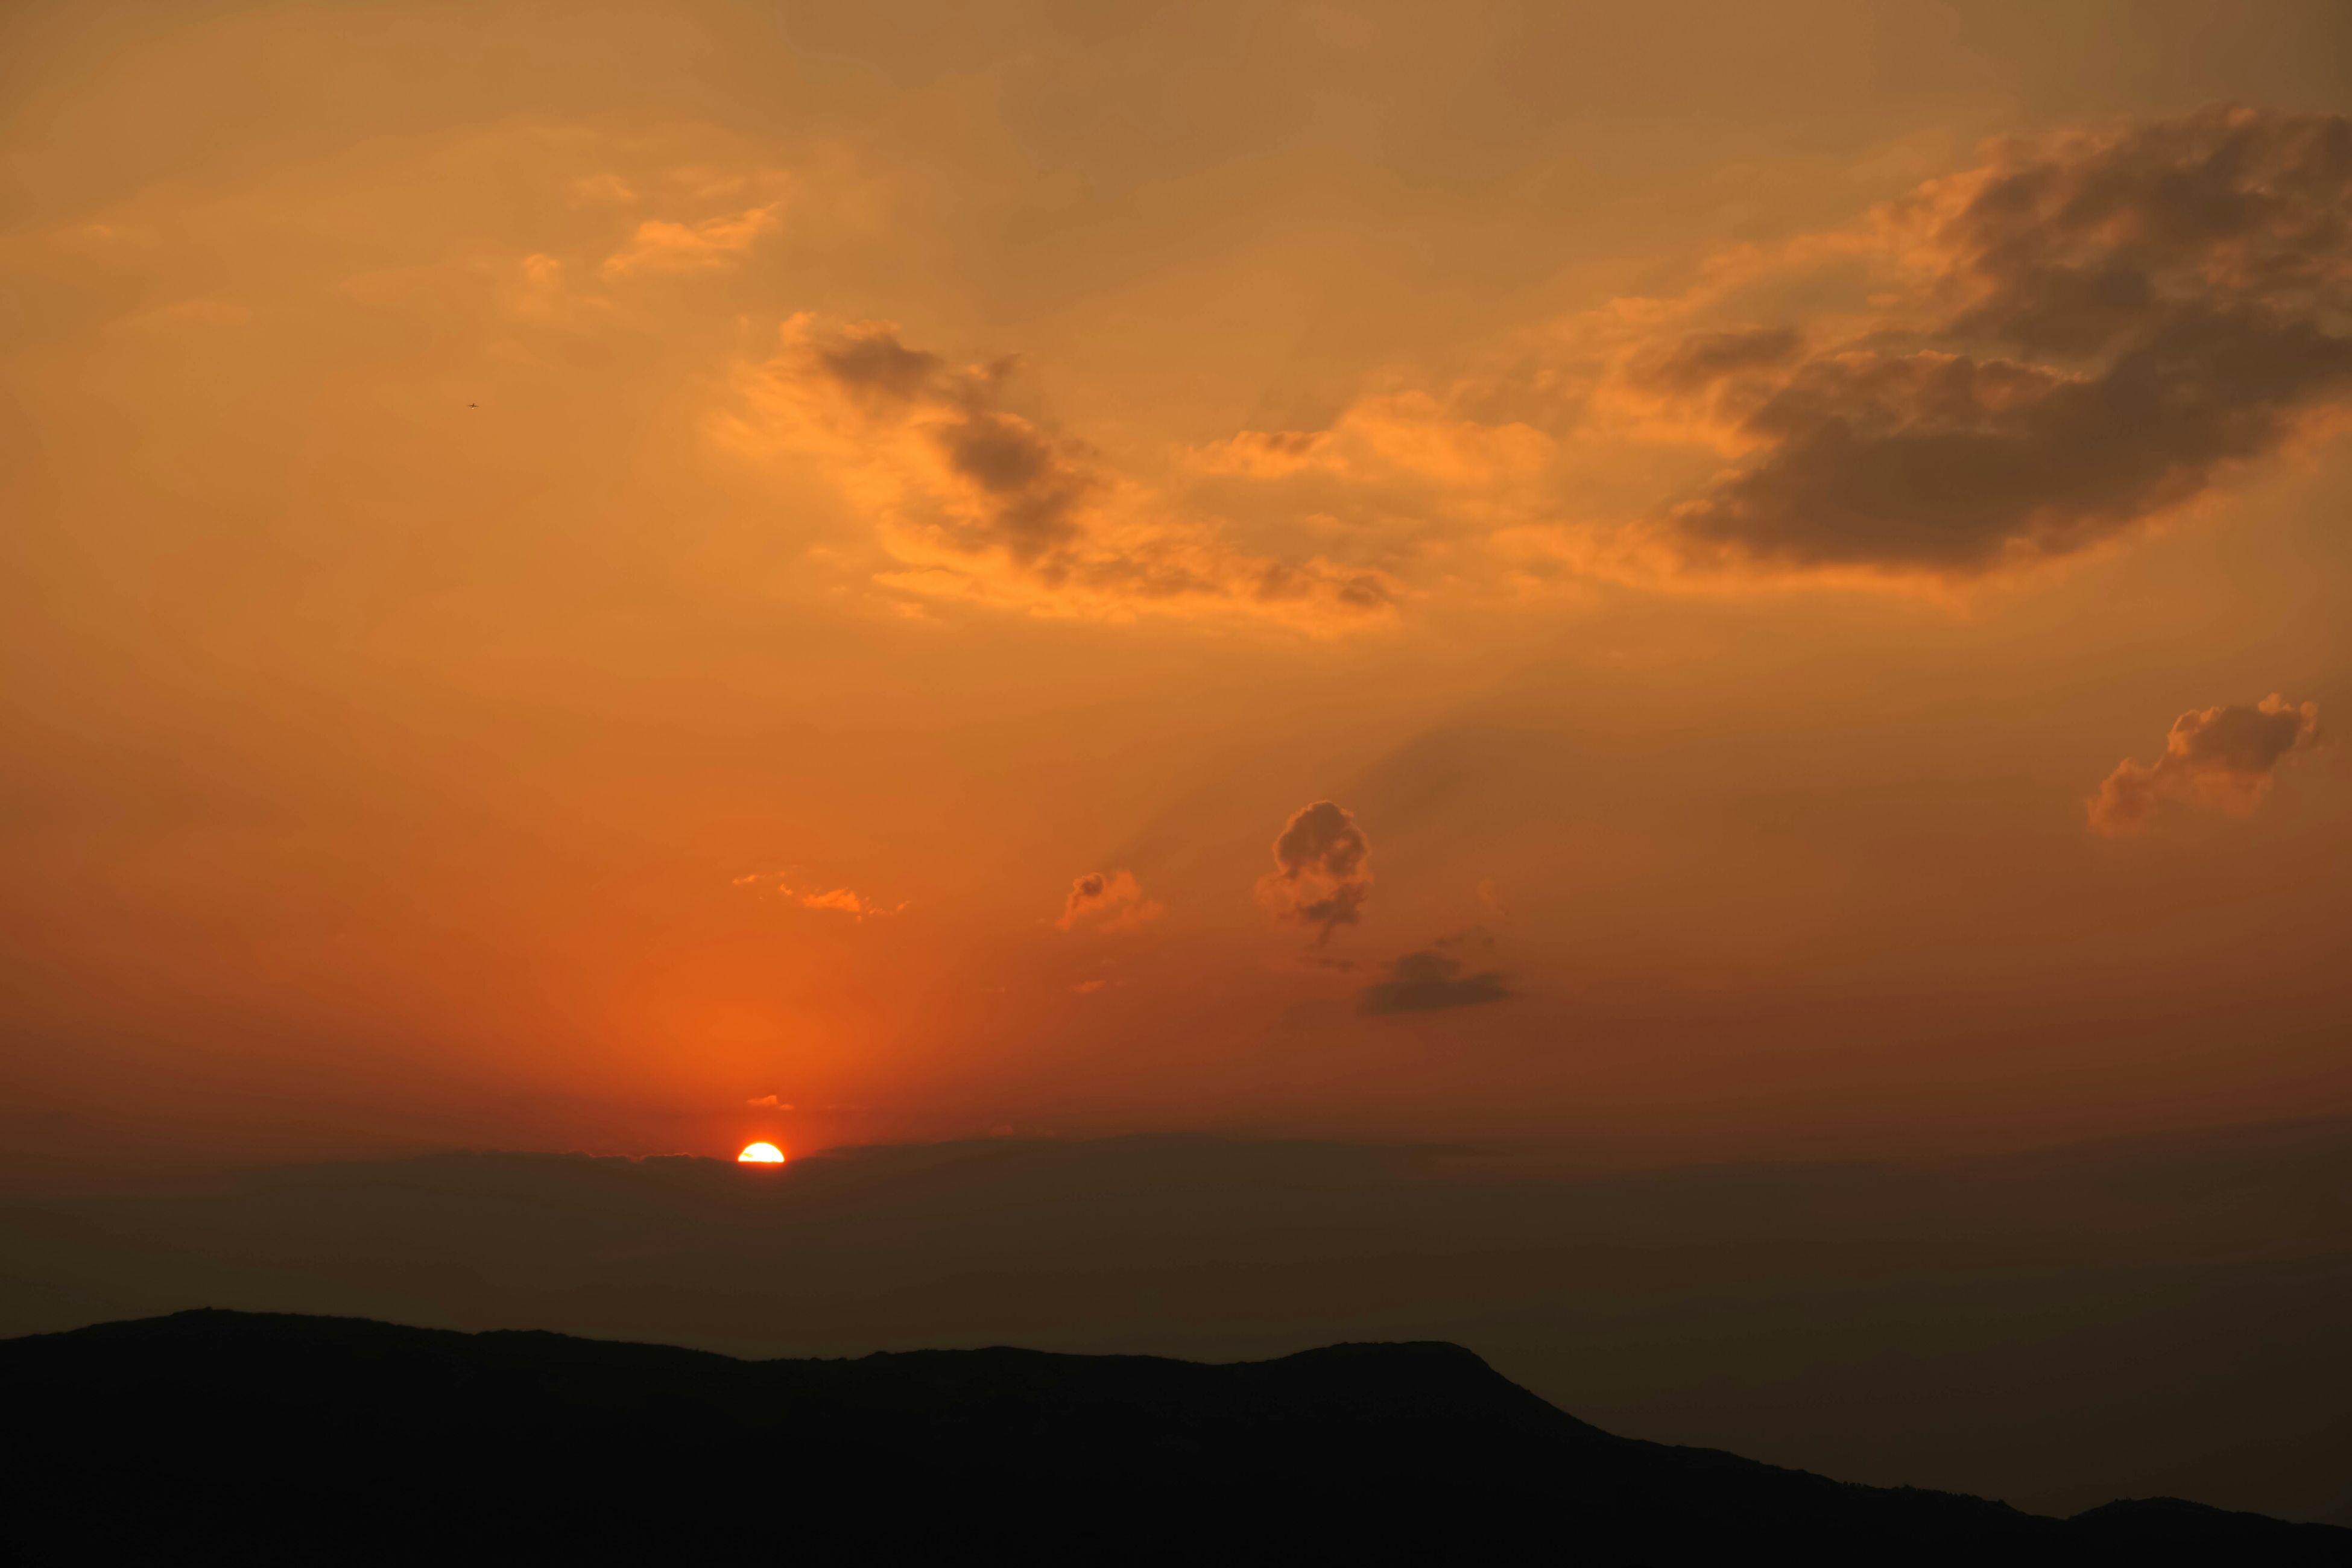 sunset, scenics, tranquil scene, sun, silhouette, beauty in nature, orange color, tranquility, sky, mountain, idyllic, nature, cloud - sky, majestic, landscape, mountain range, sunlight, cloud, non-urban scene, outdoors